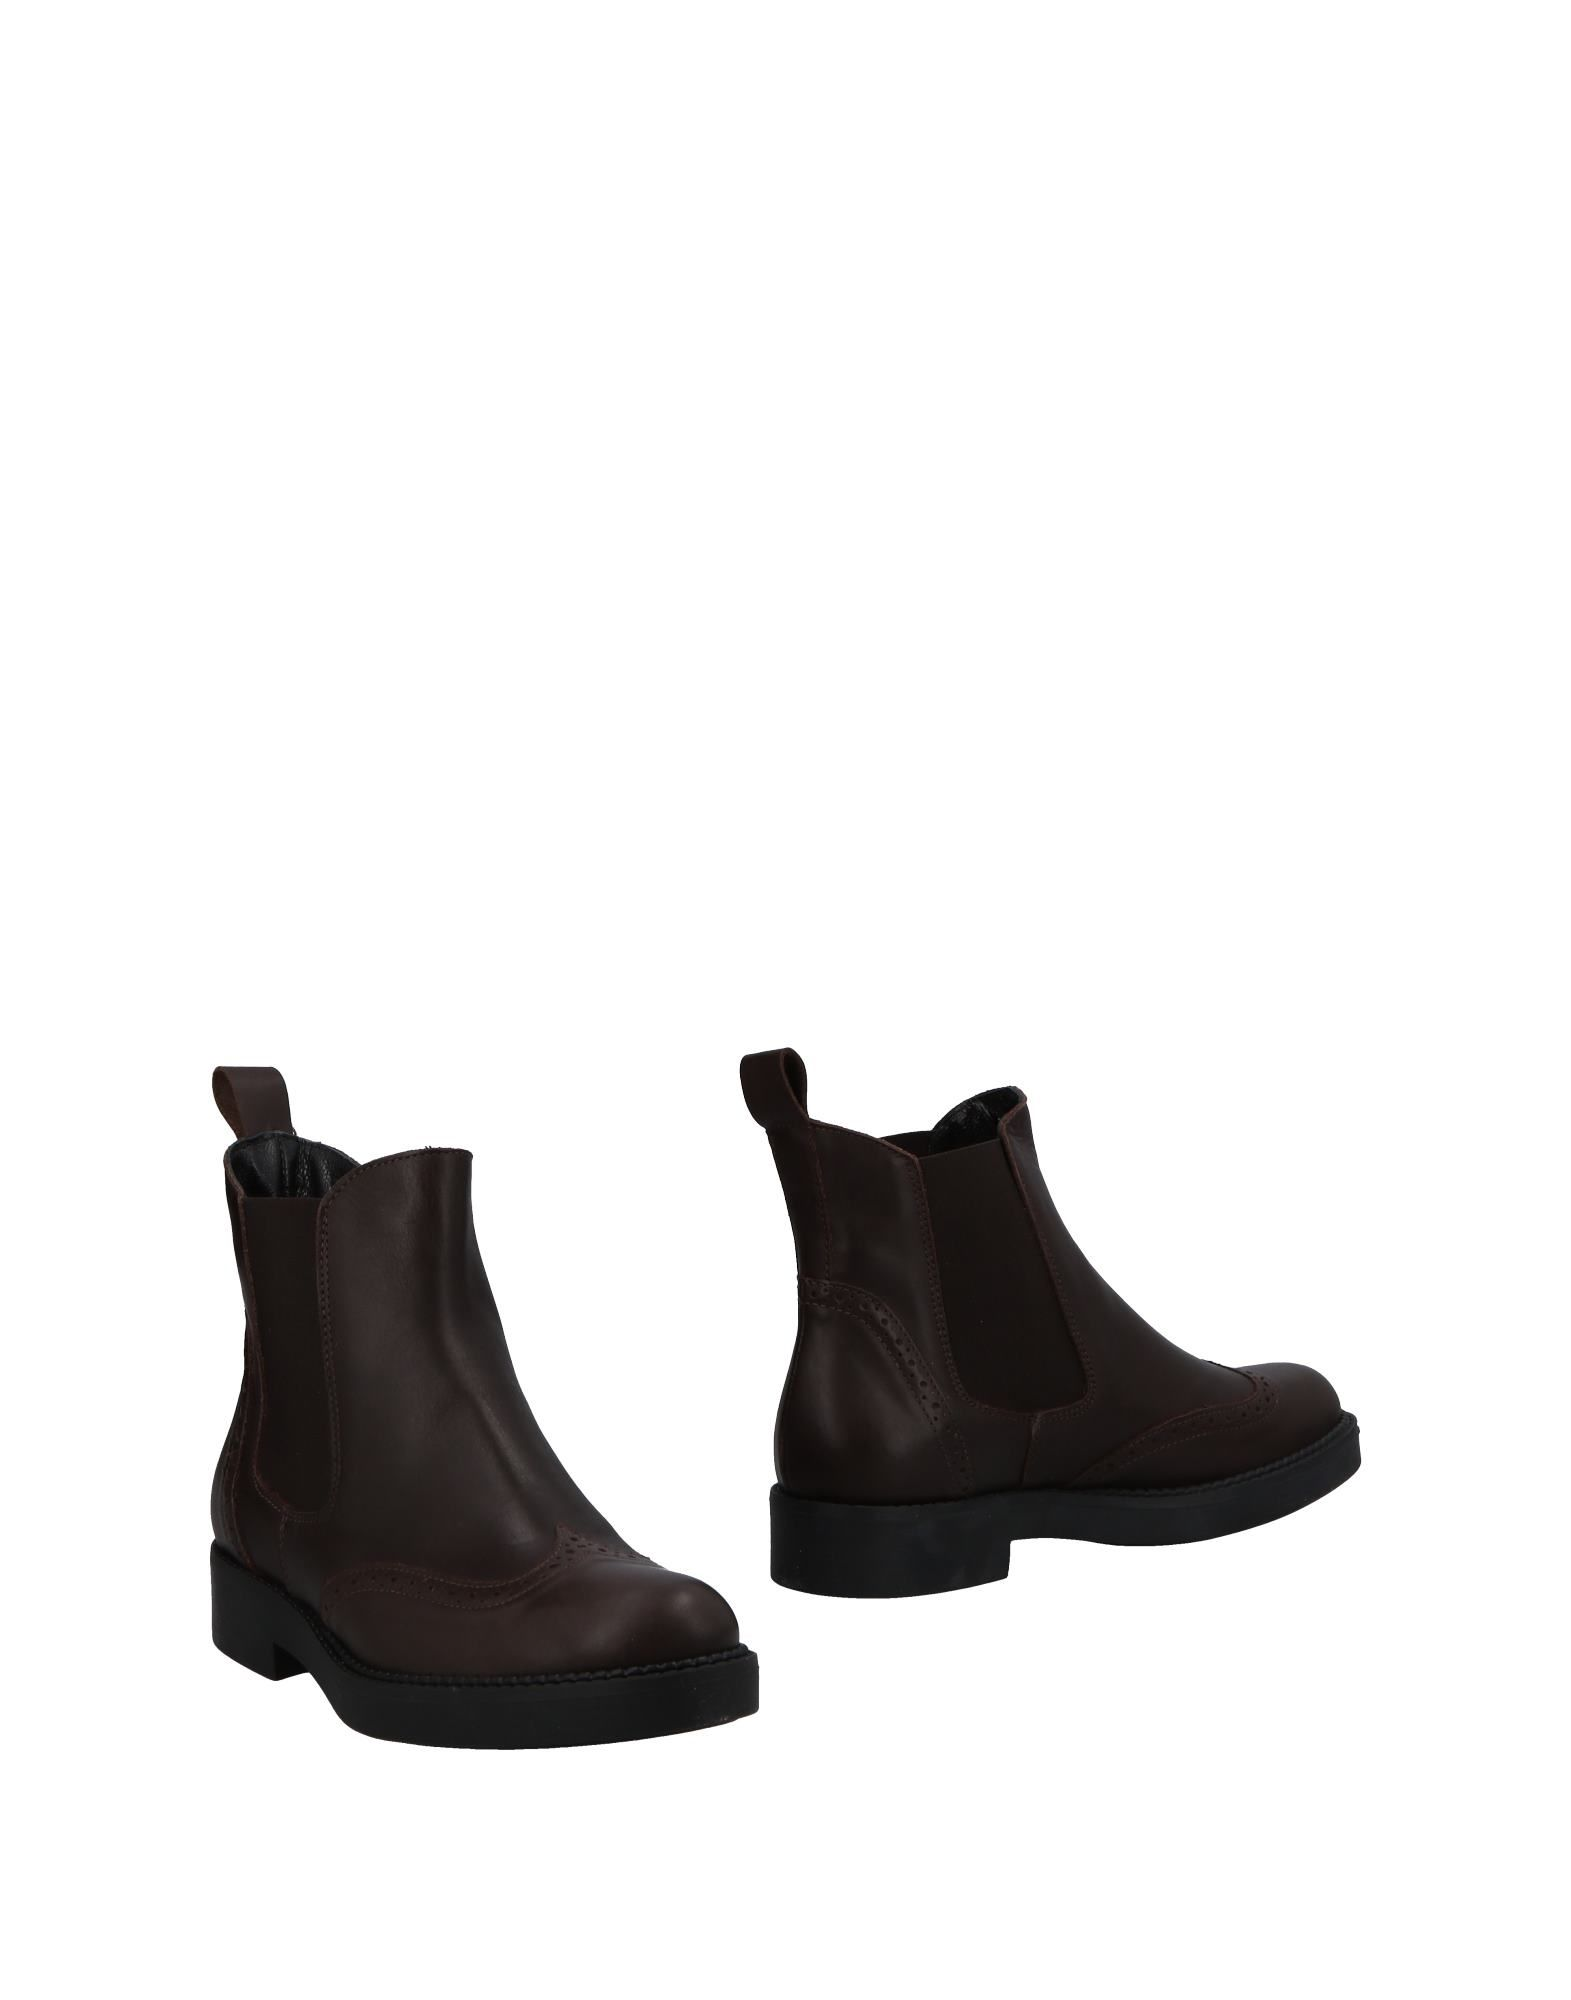 Gut Chelsea um billige Schuhe zu tragenPhil Gatièr By Repo Chelsea Gut Boots Damen  11480033FJ 501cf0